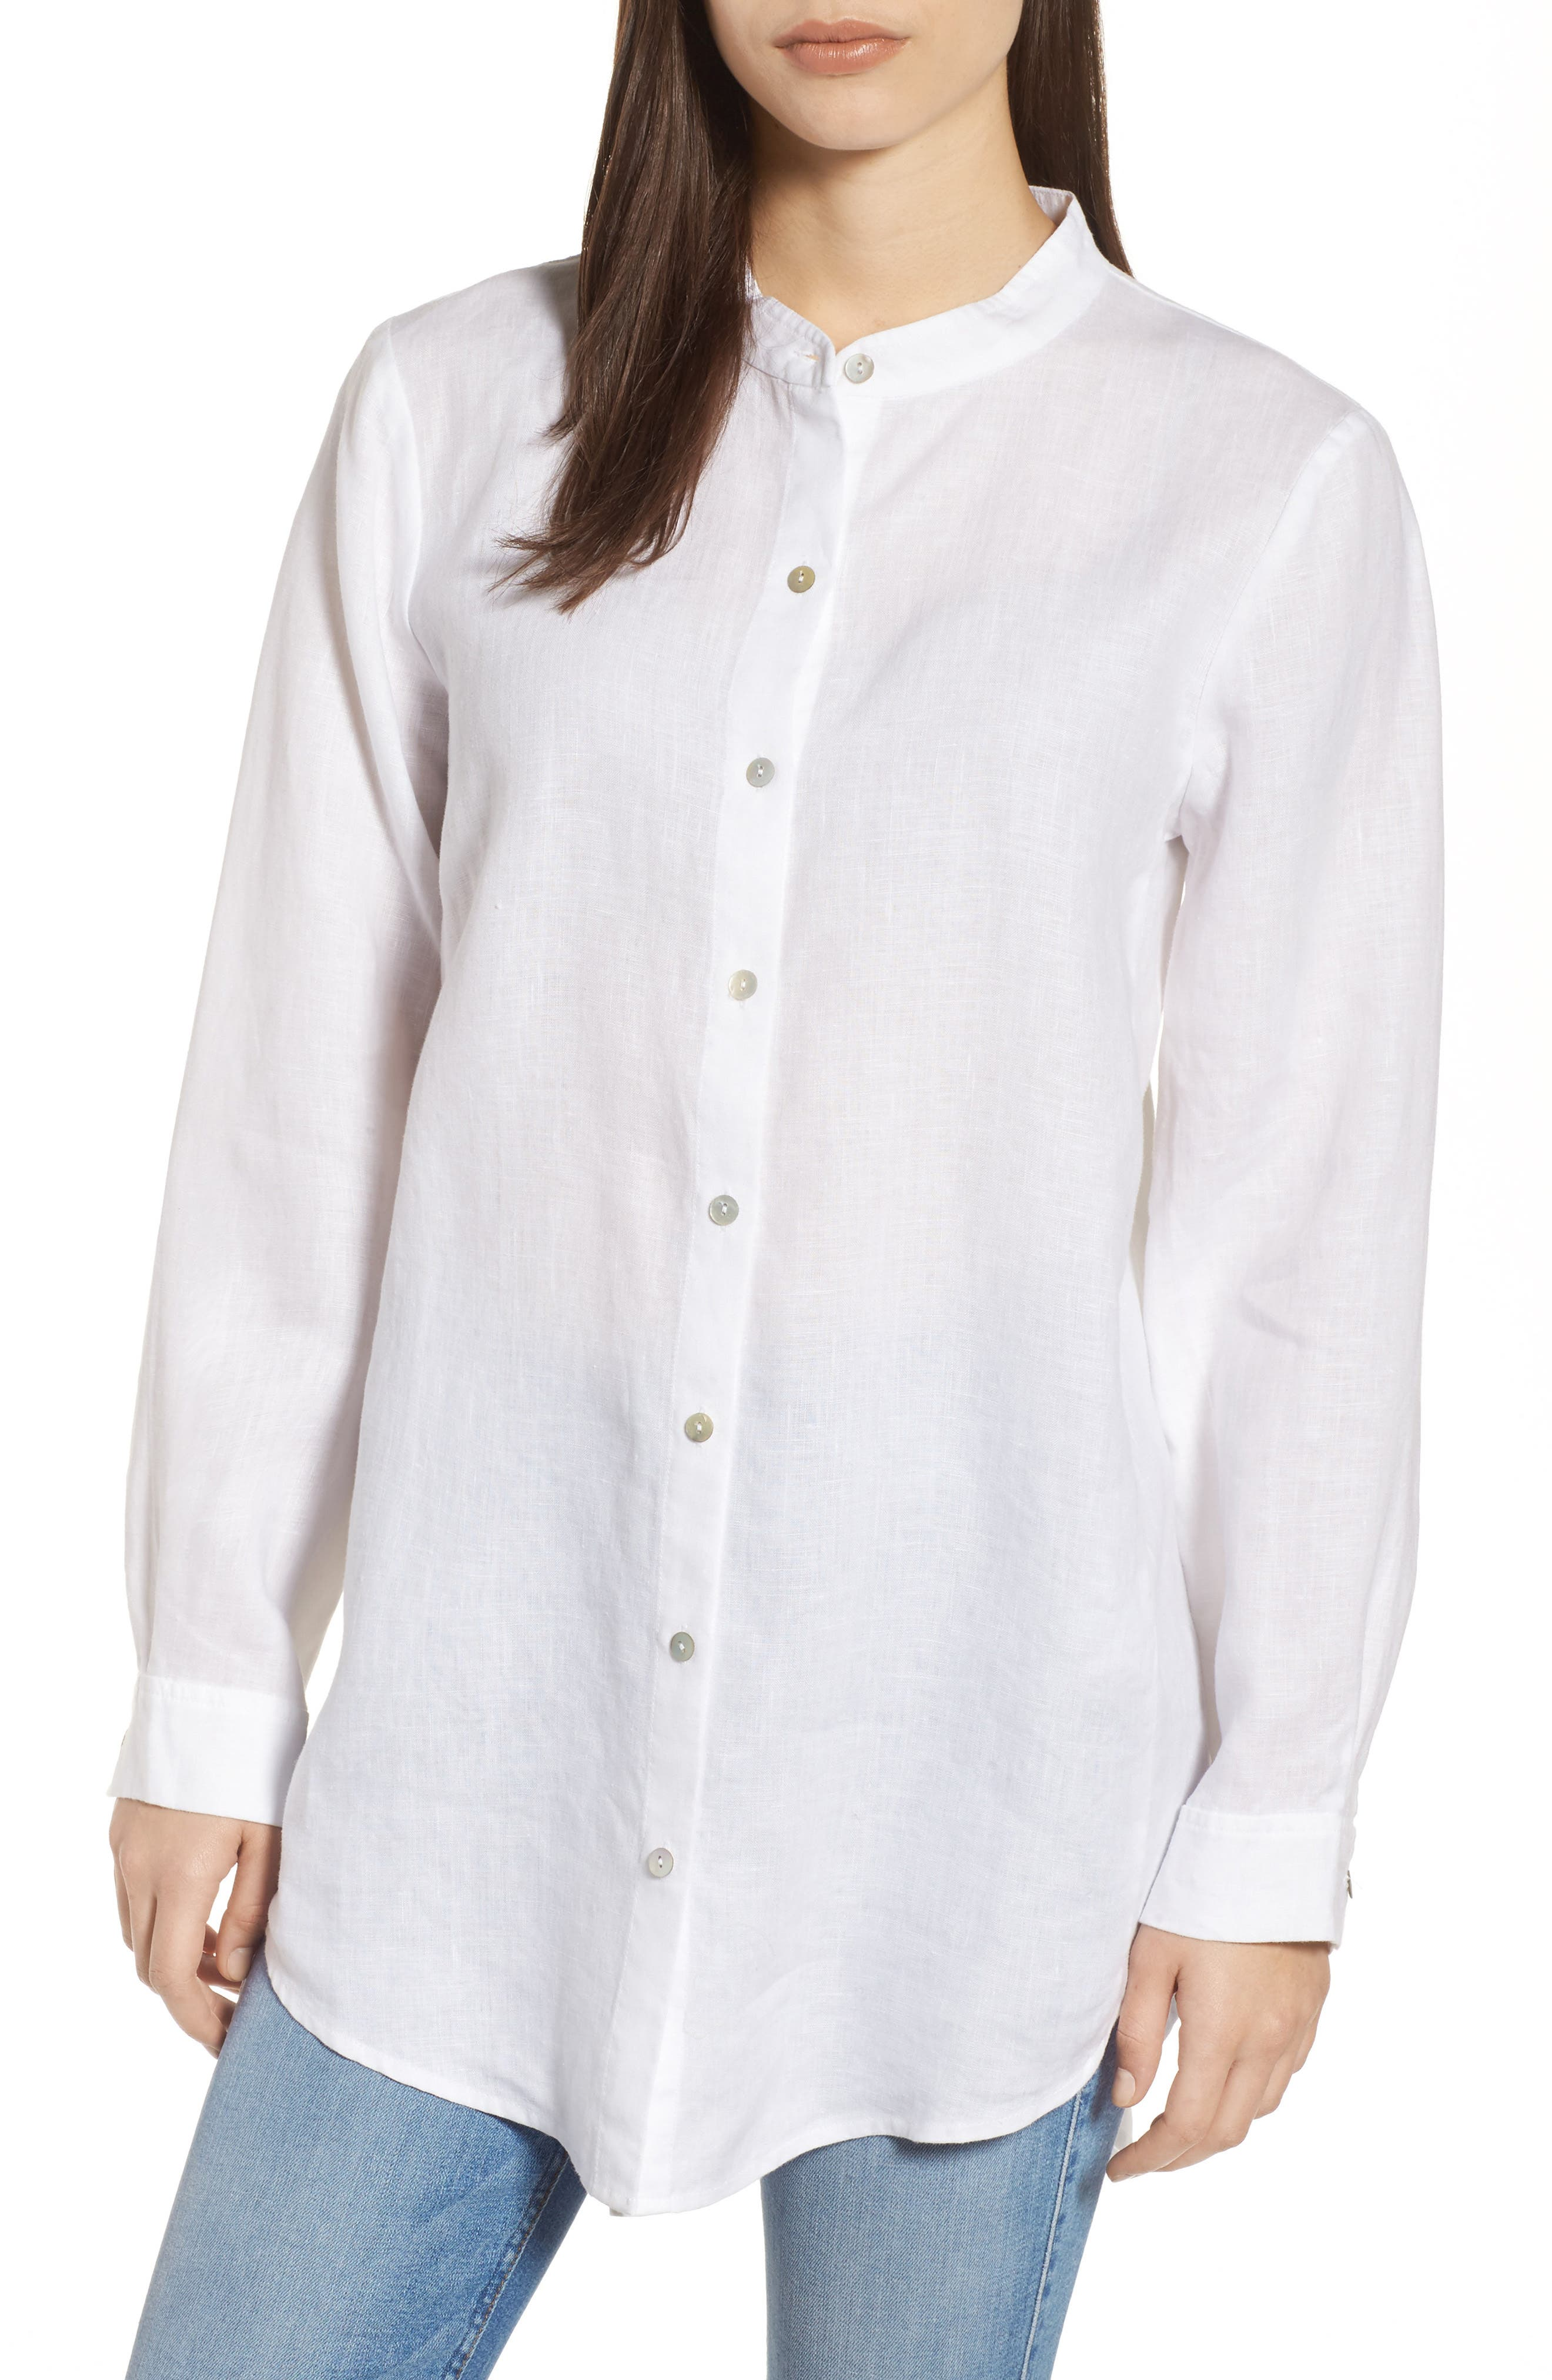 Organic Linen Tunic Shirt,                             Main thumbnail 1, color,                             100